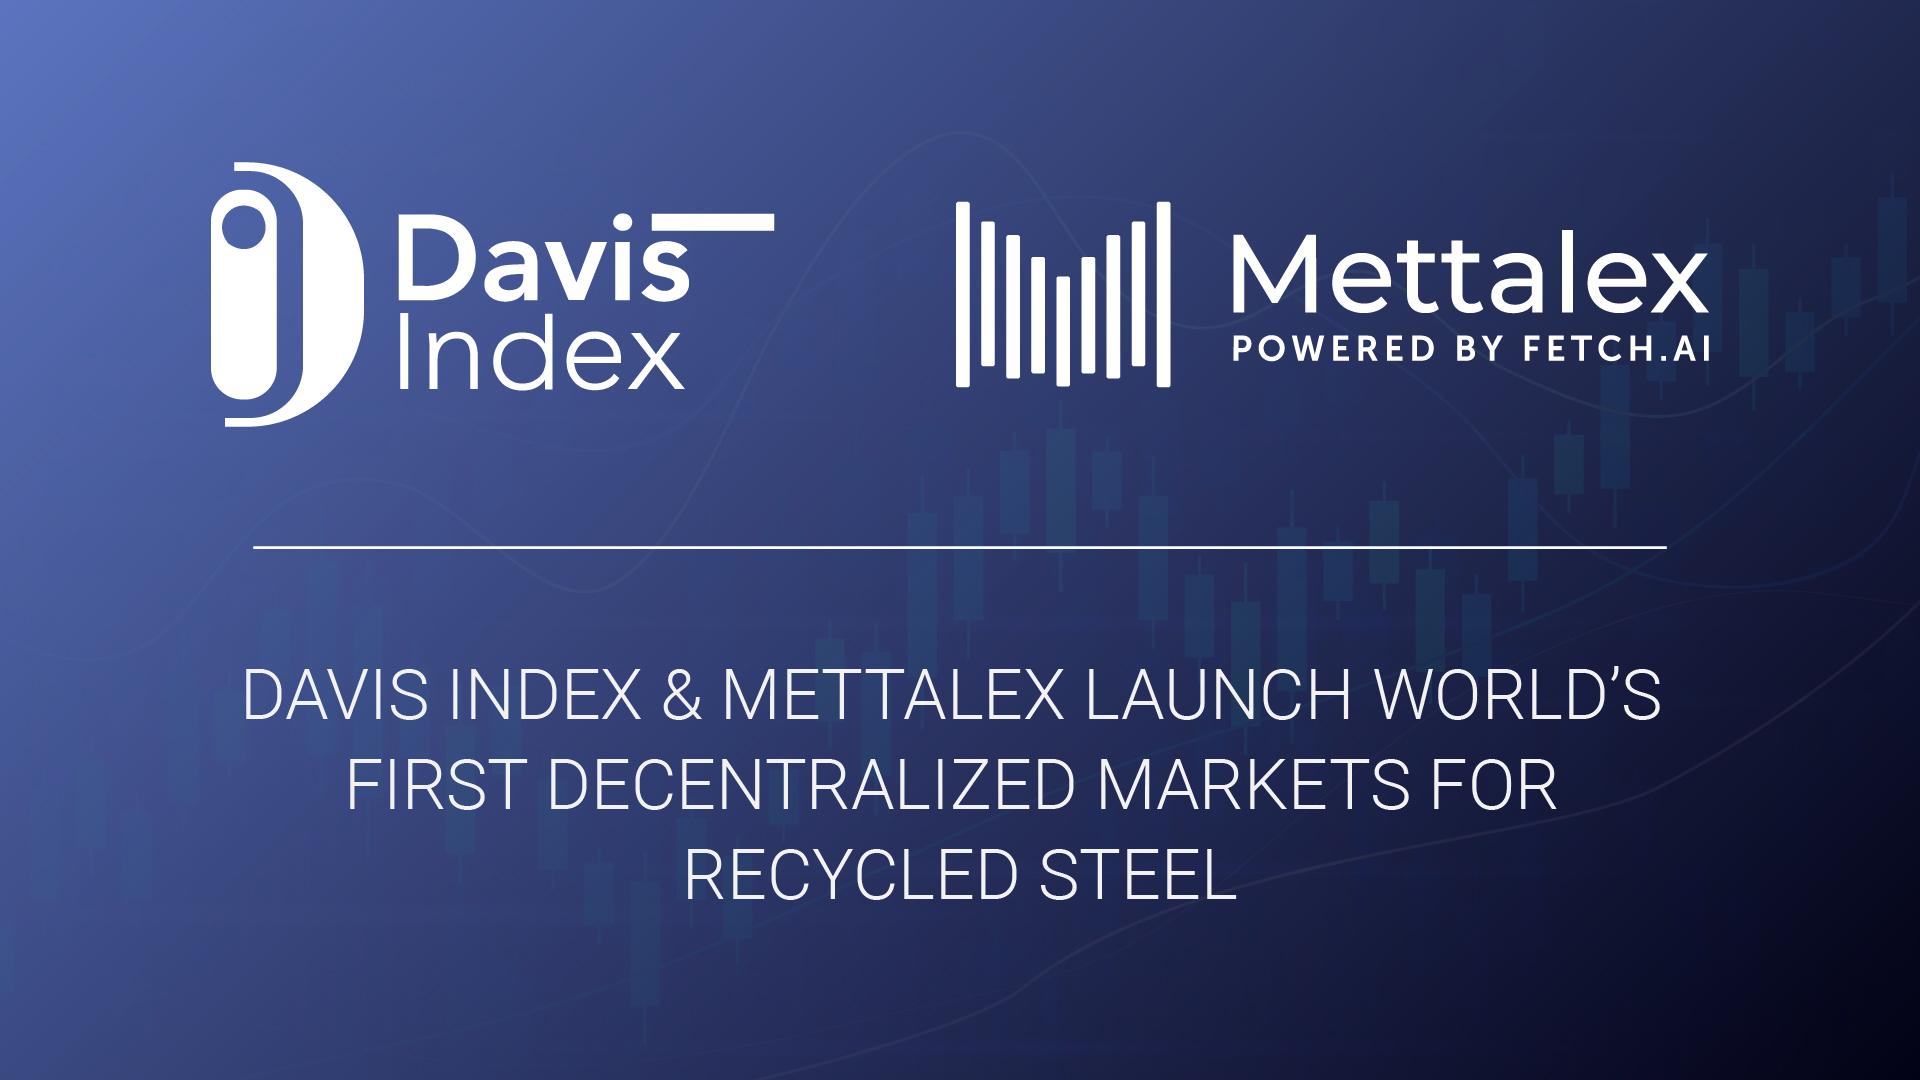 https://mettalex.com/wp-content/uploads/MTLX-Davis-Index-Borderless.jpg